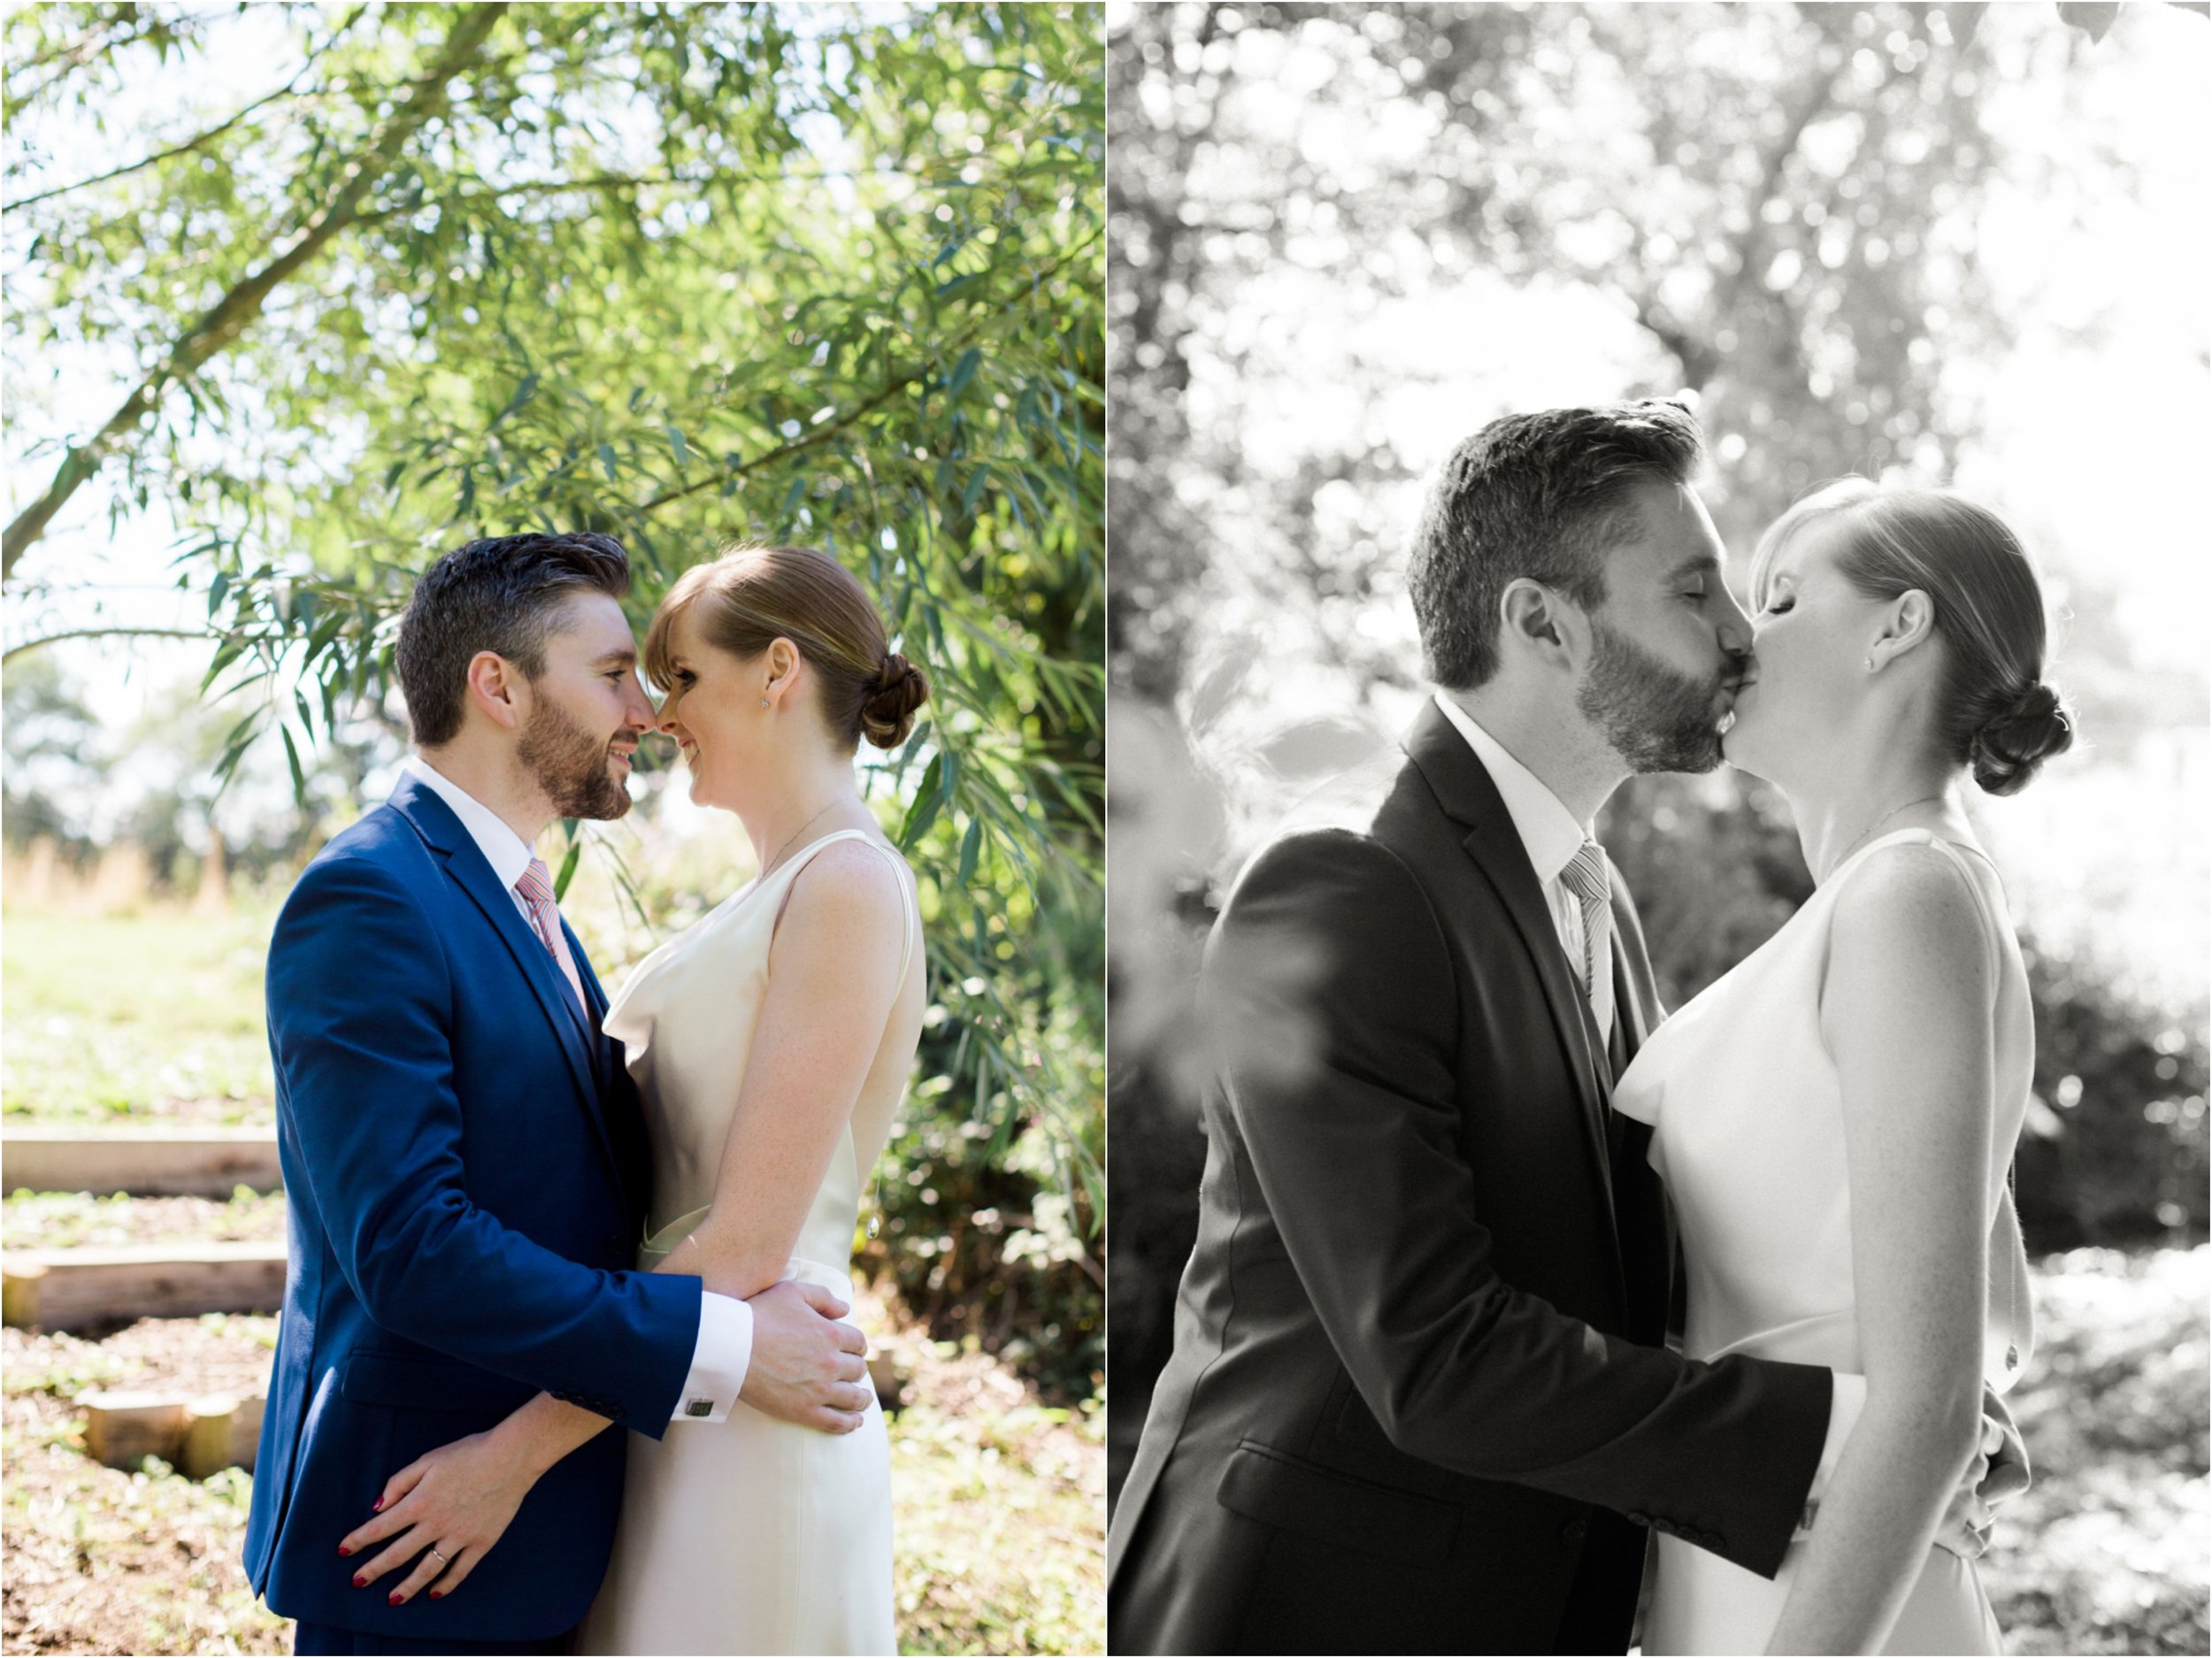 Sophie Evans Photography, Claire & John, Swallows Nest Barn Wedding, Warwickshire Wedding Photographer-84.jpg